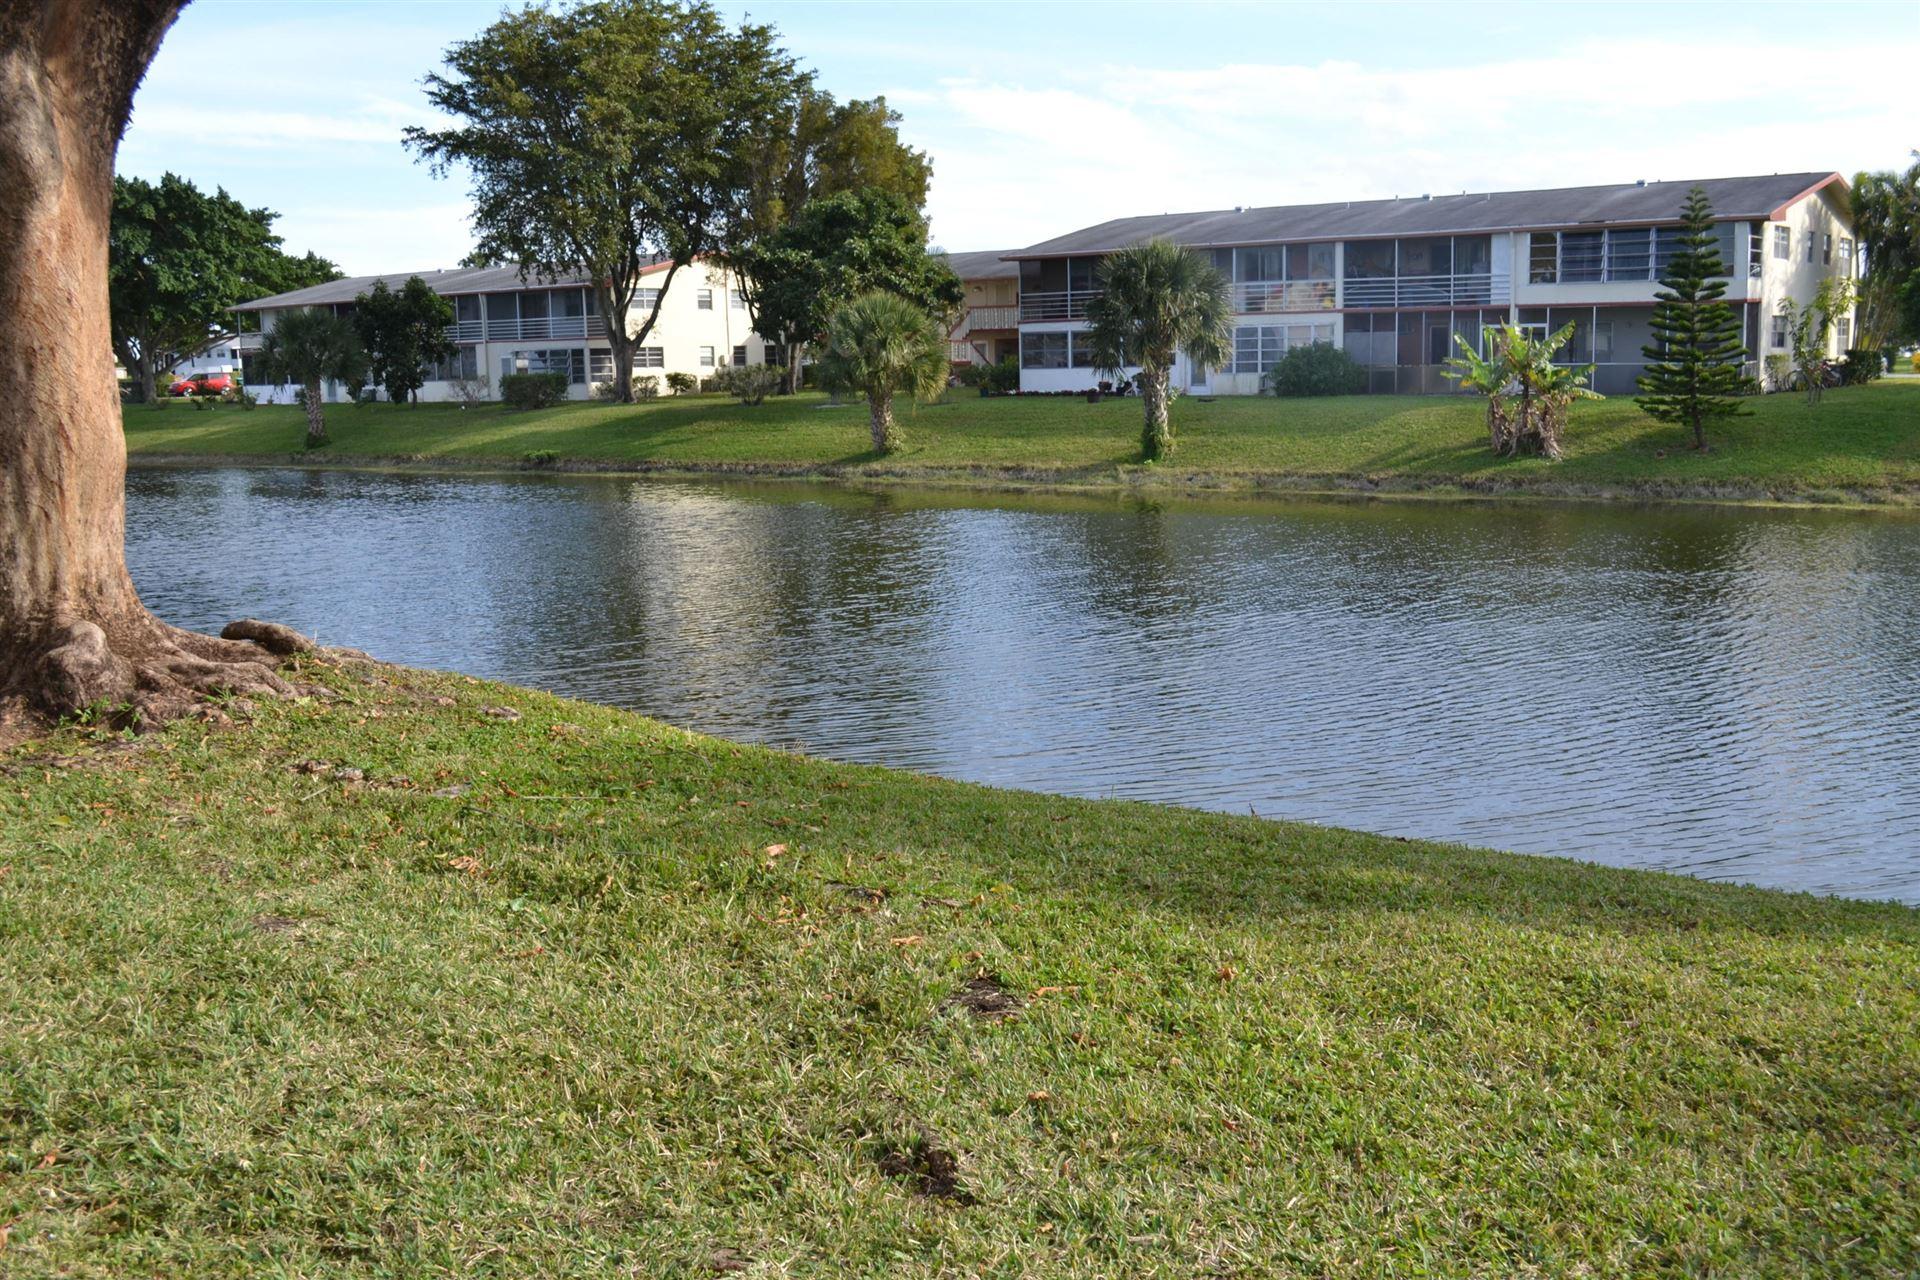 50 Northampton C, West Palm Beach, FL 33417 - MLS#: RX-10686007